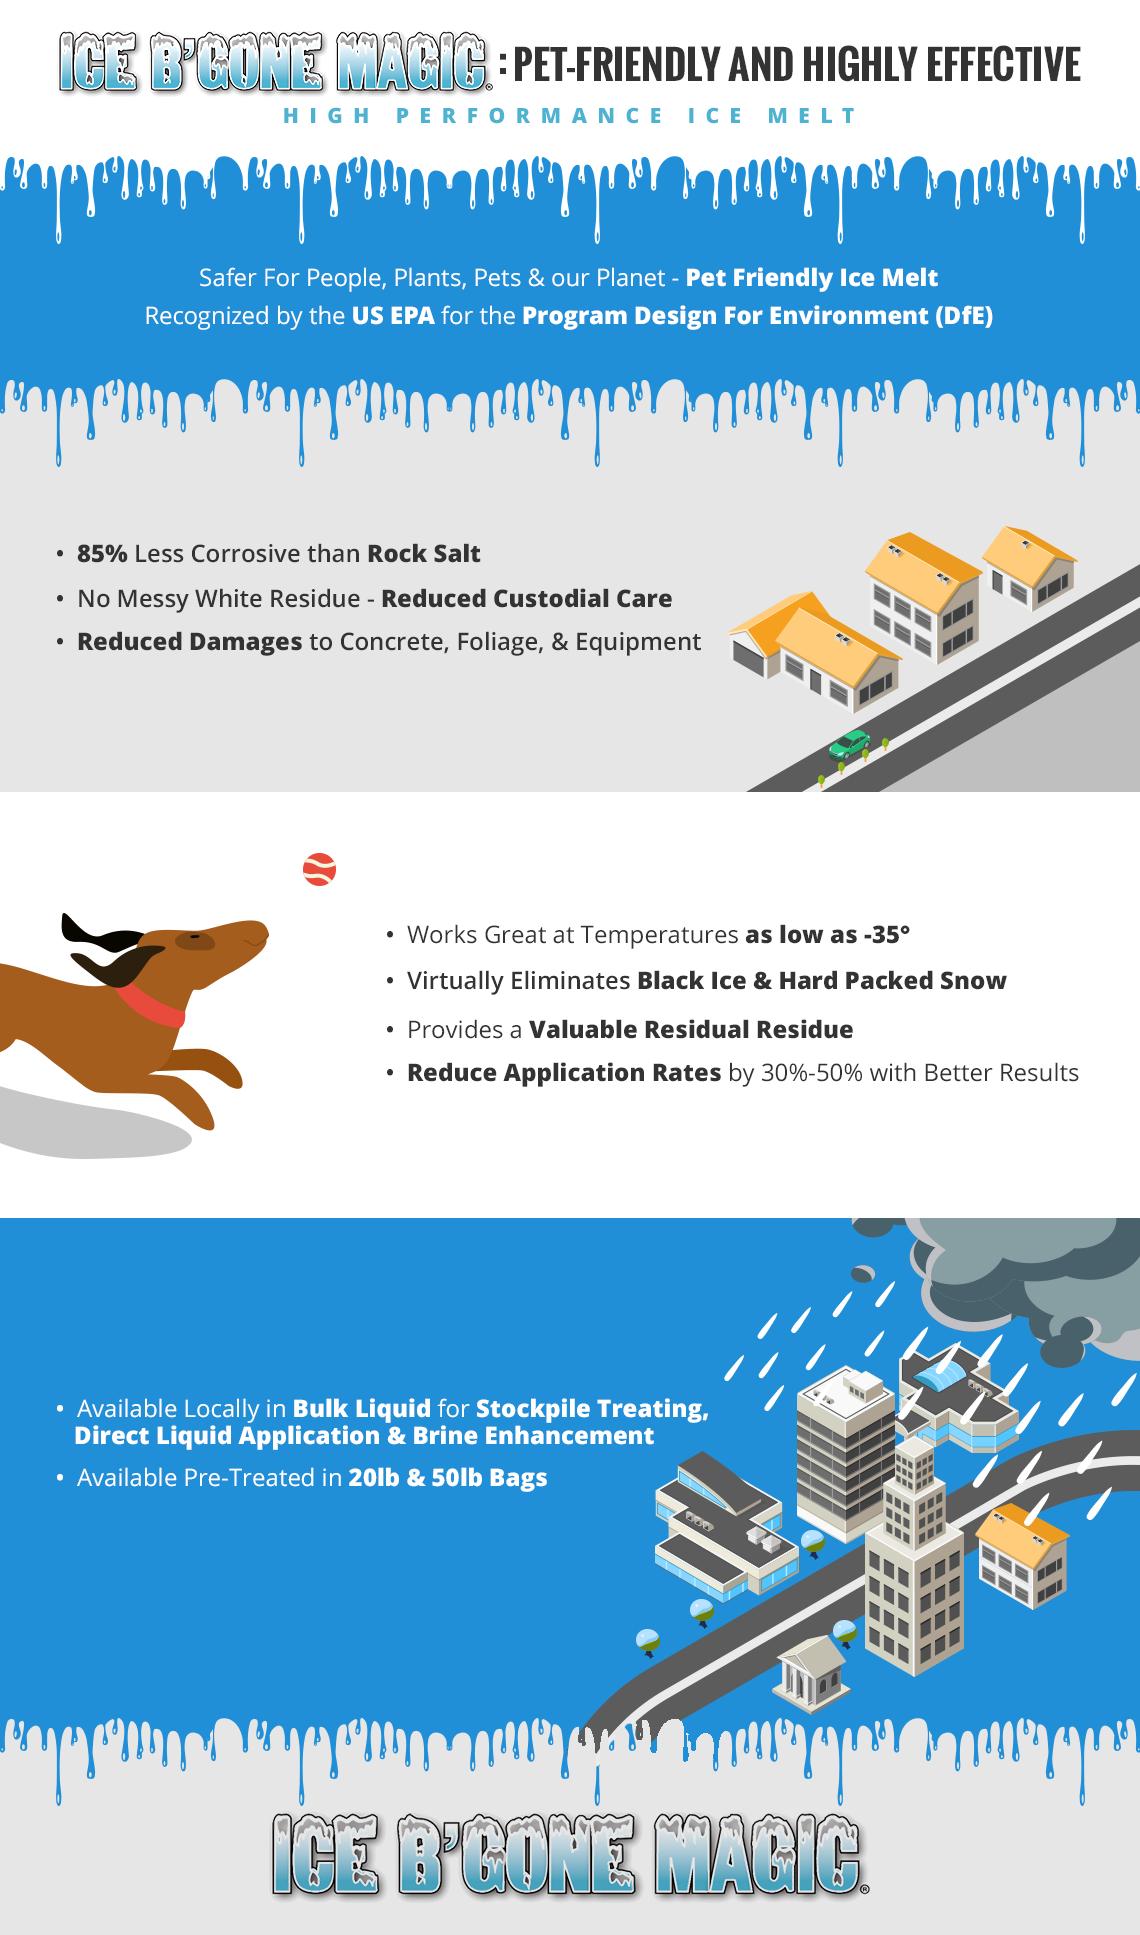 icemelt_infographic